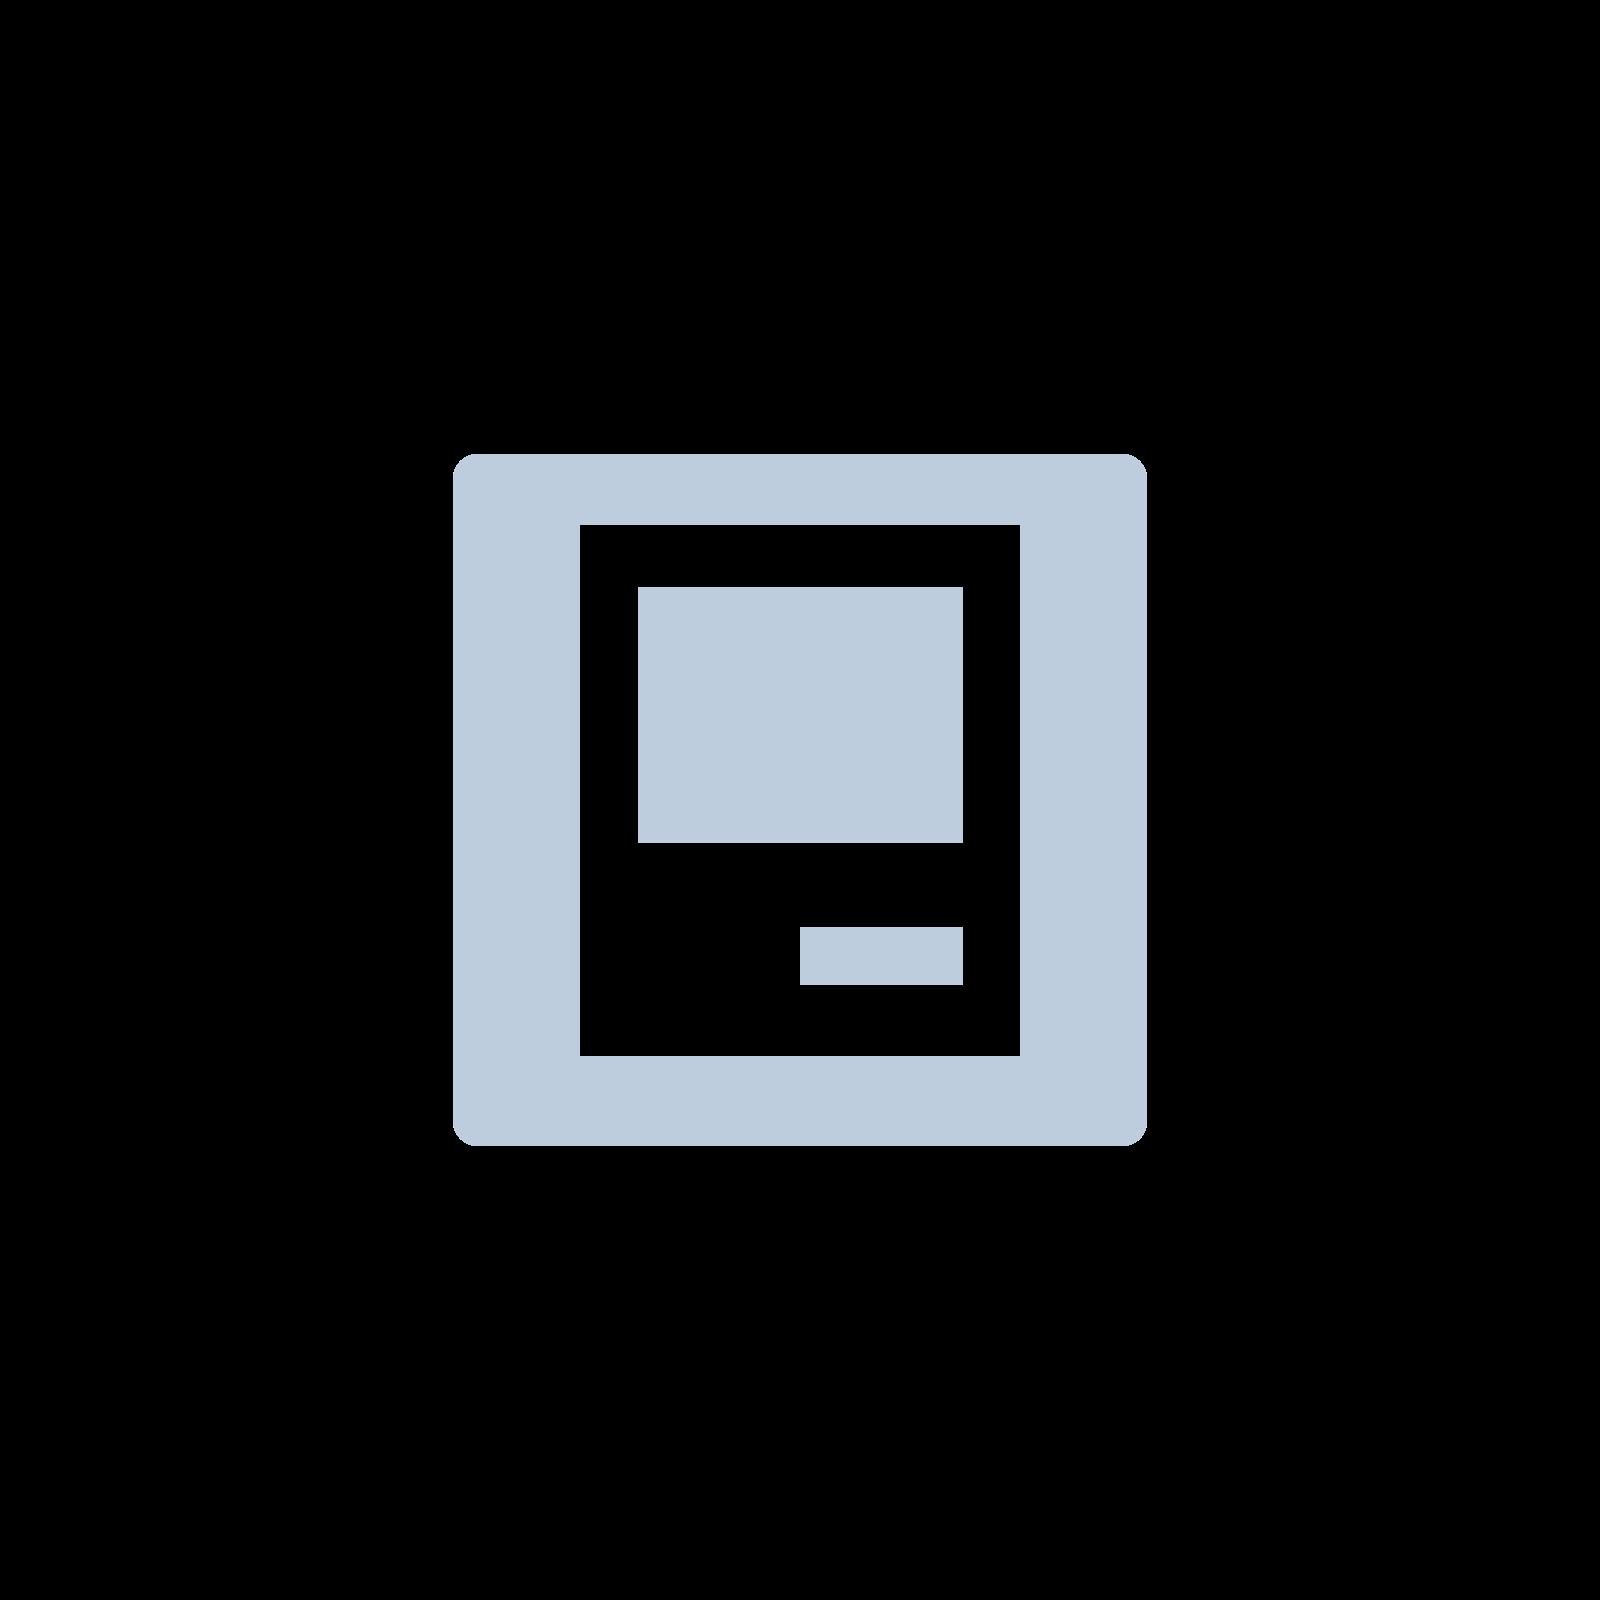 Logitech Create iPad Pro 12,9 Tastatur Case für iPad Pro - Blau